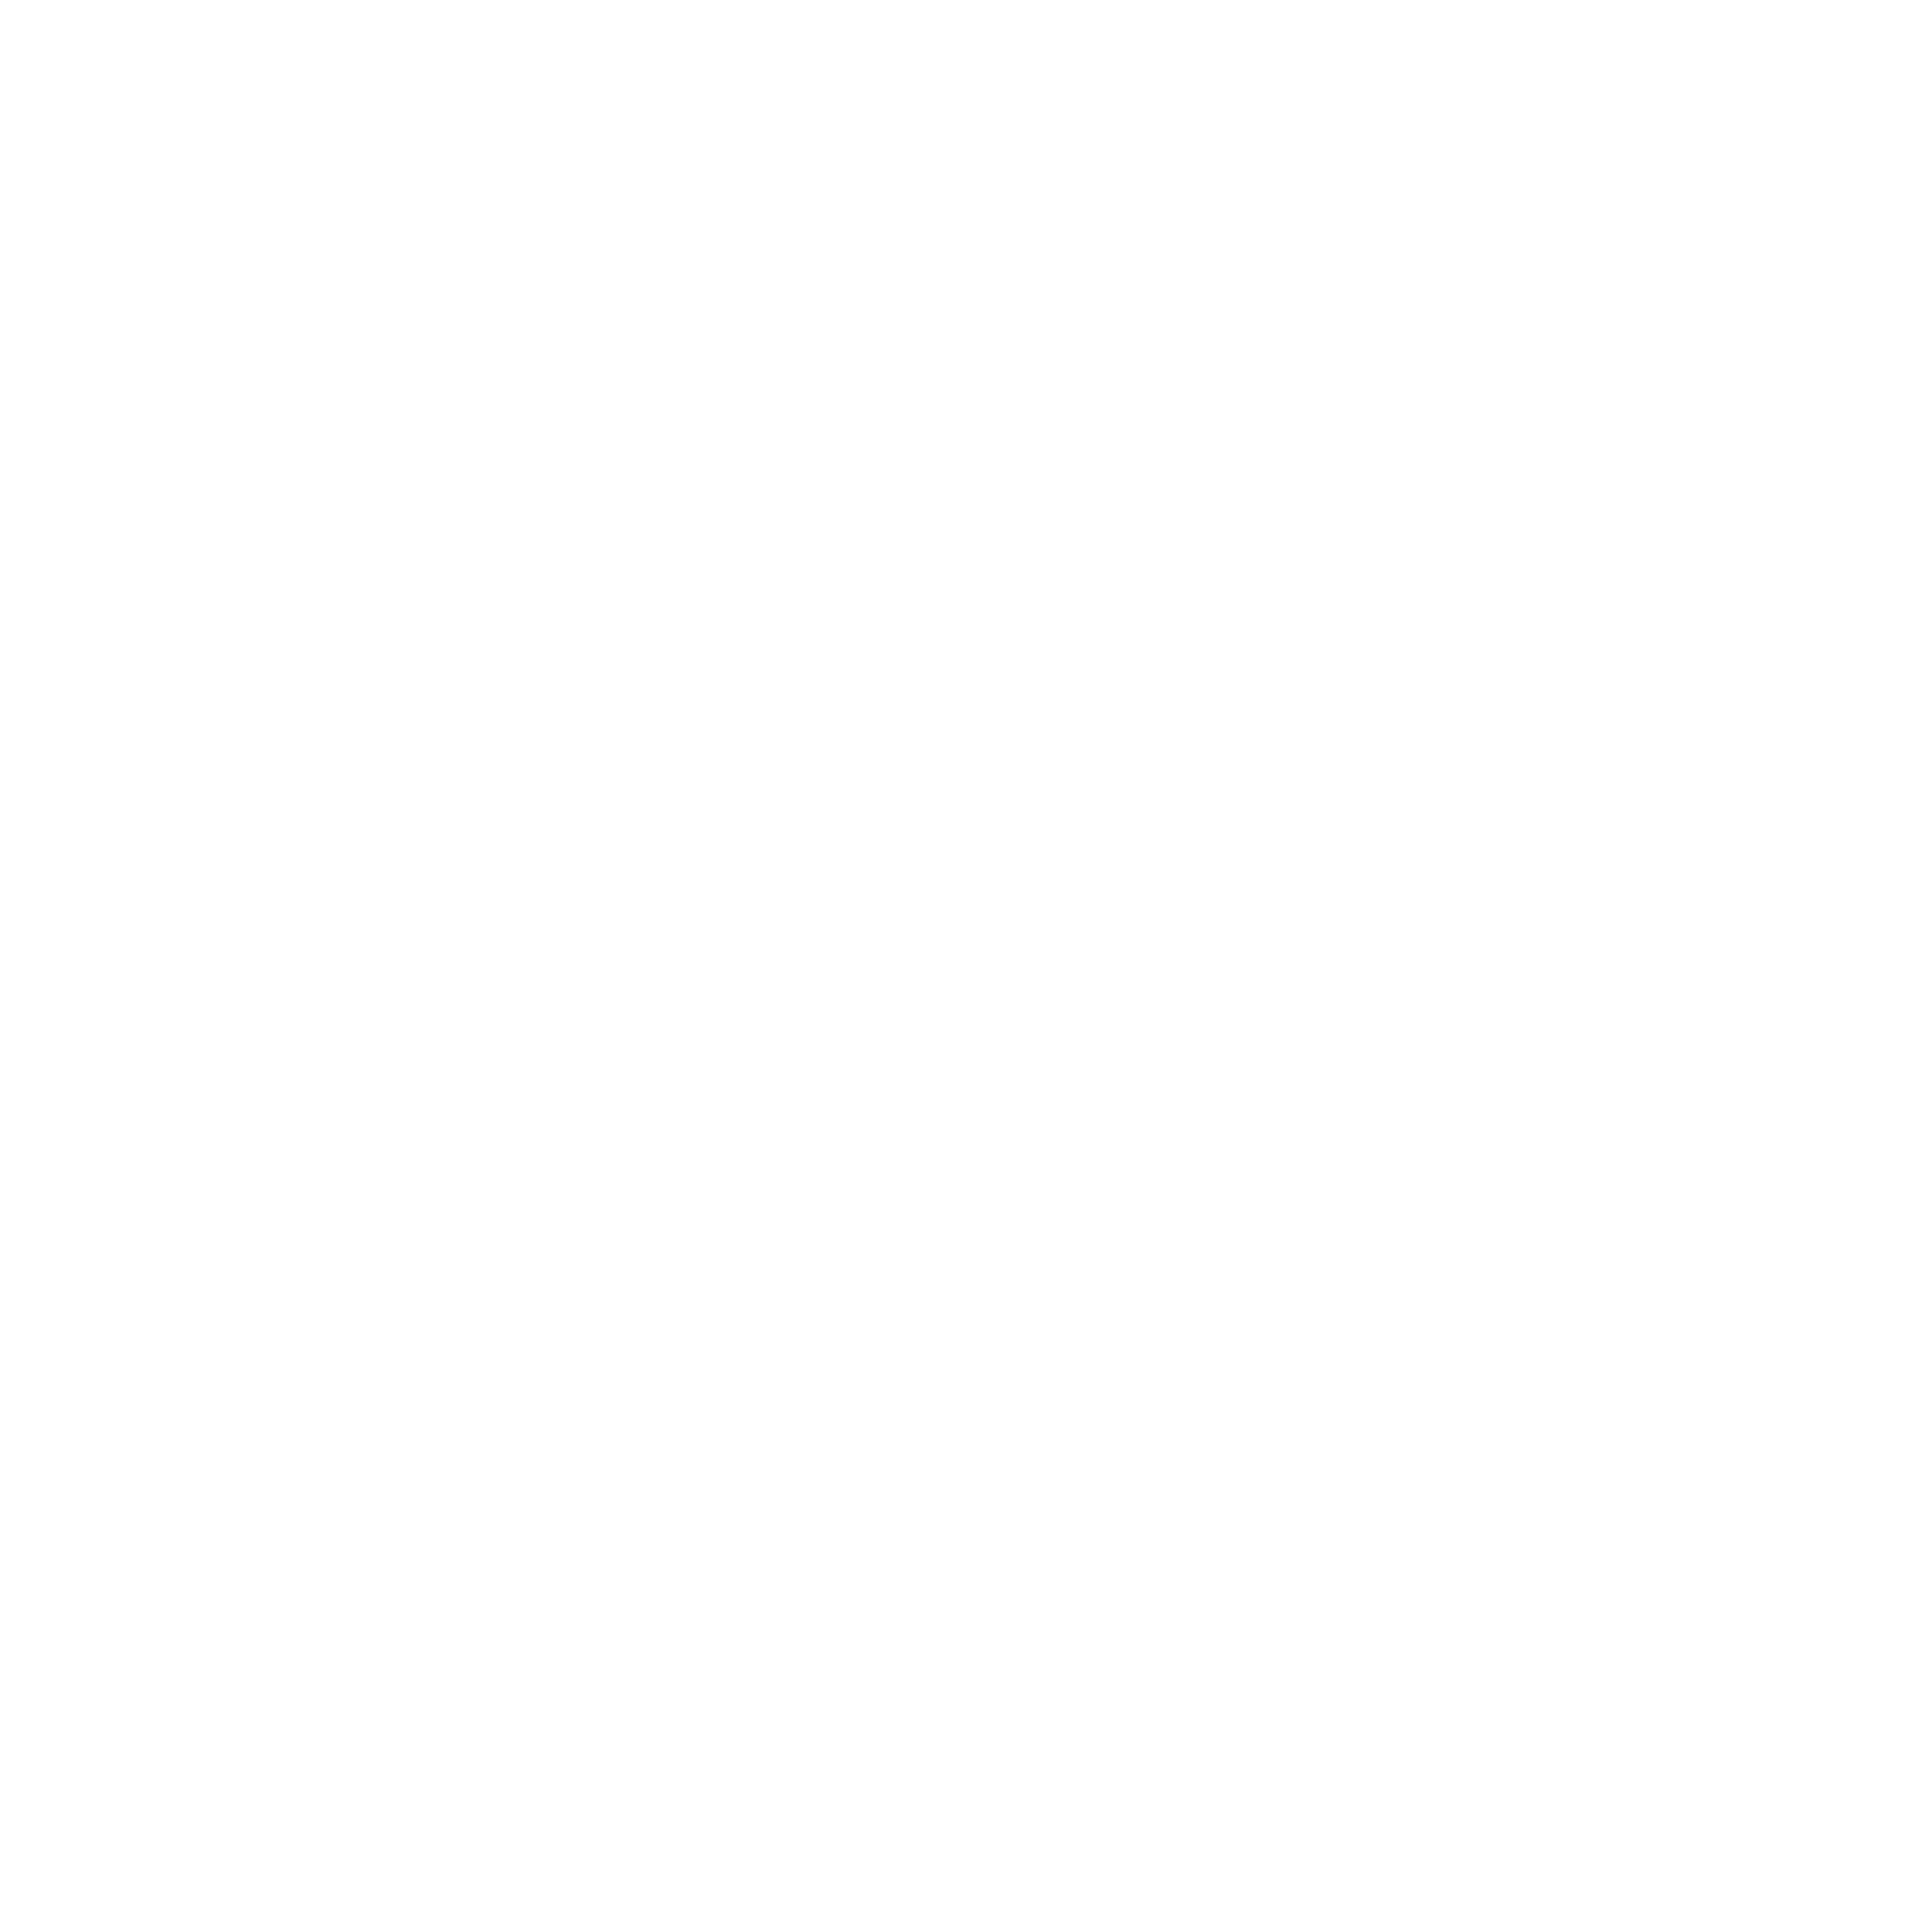 BHP Billiton Logo PNG Transparent & SVG Vector.